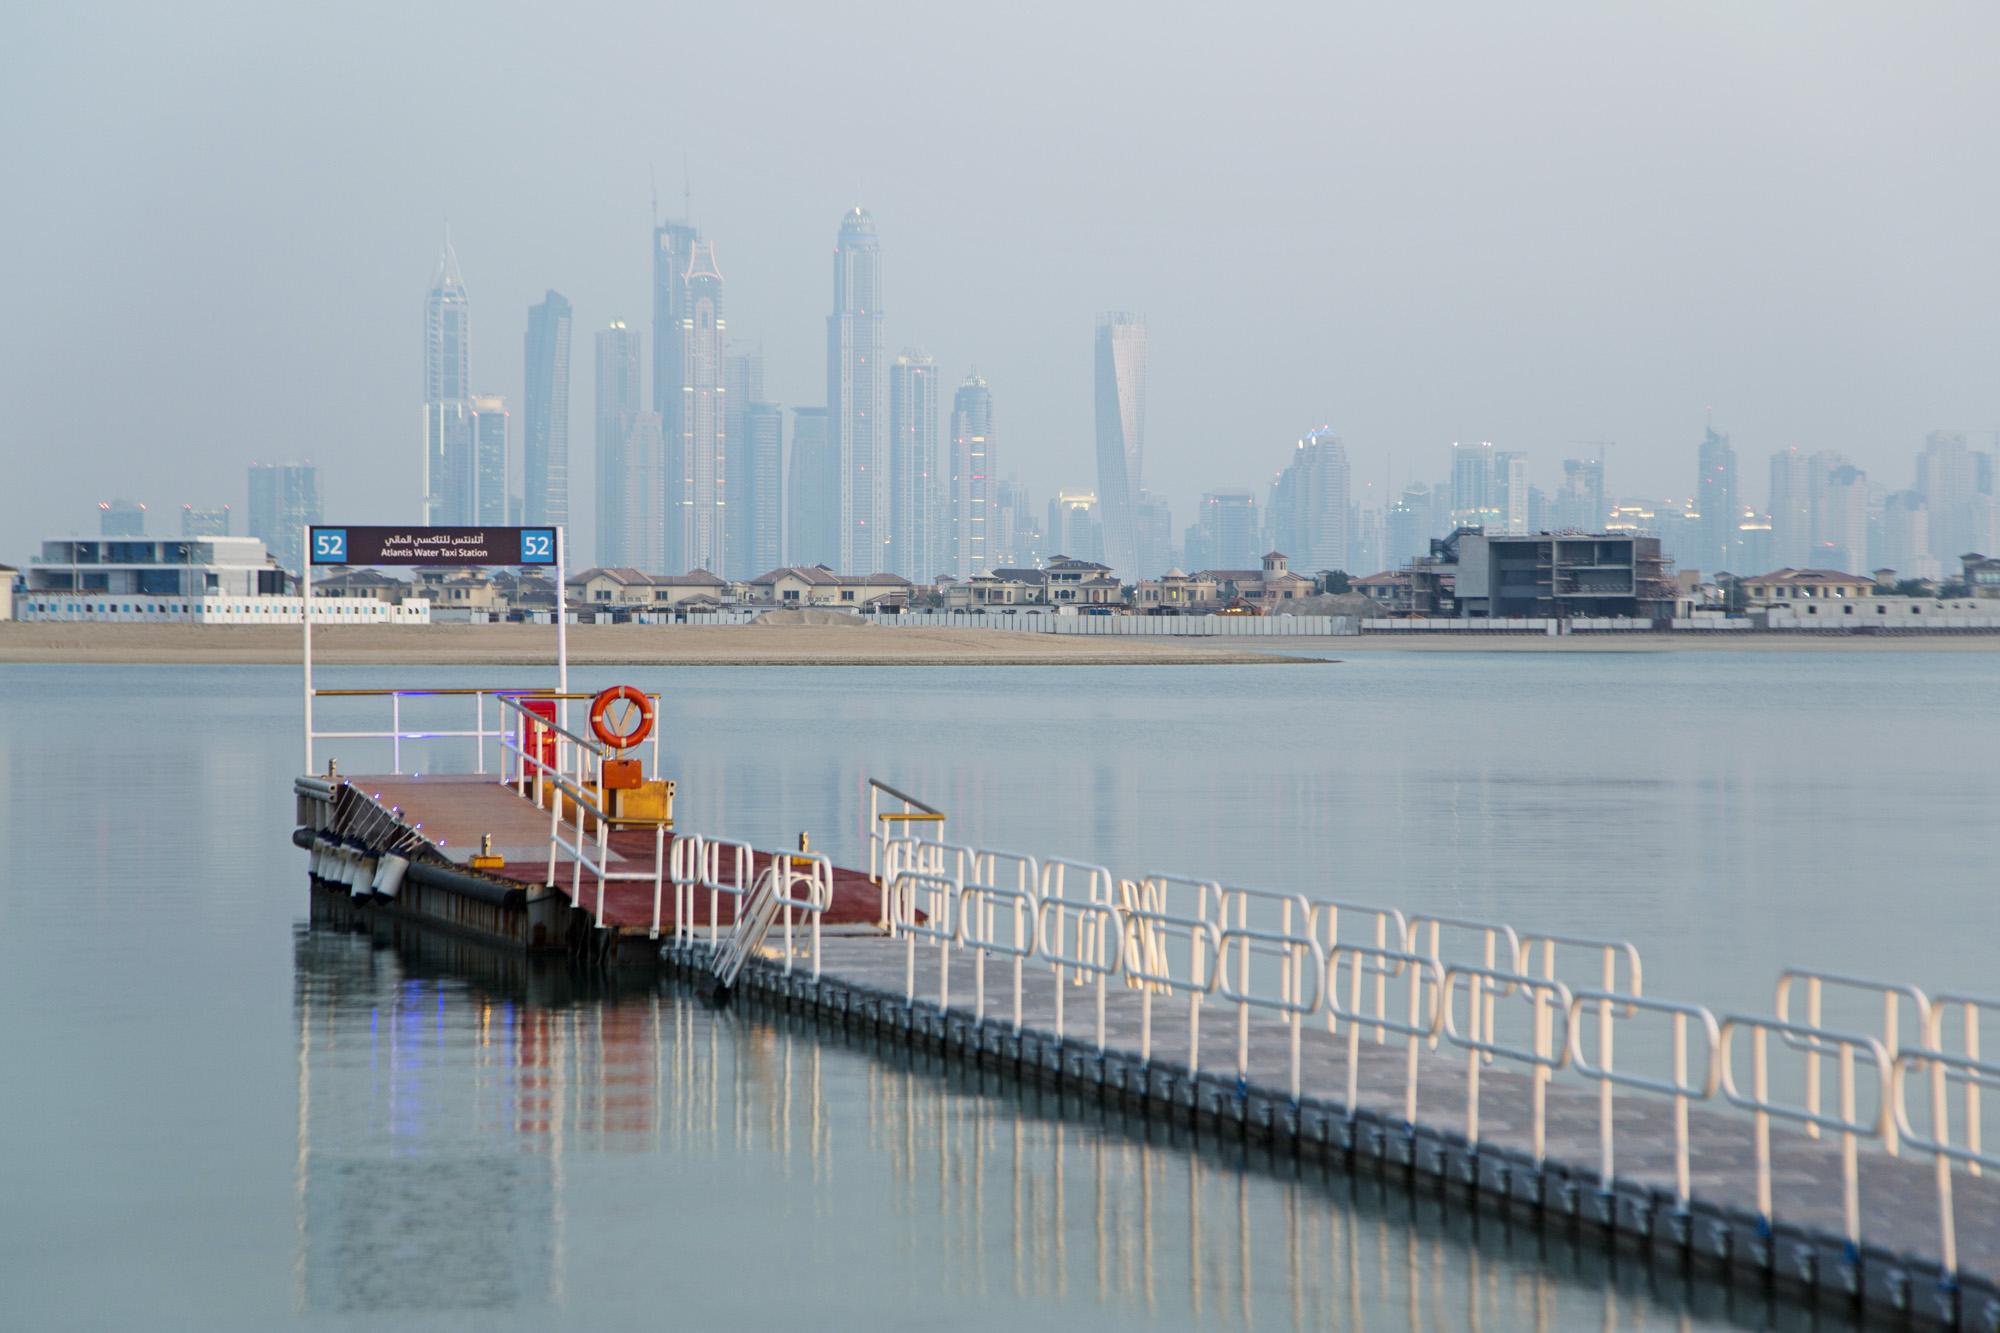 VAE, Vereinigte arabische Emirate, Dubai, Atlantis The Palm Hotel, Anleger, Skyline  Engl.: UAE, United Arab Emirates, Dubai, Atlantis The Palm Hotel, jetty, pier, Skyline